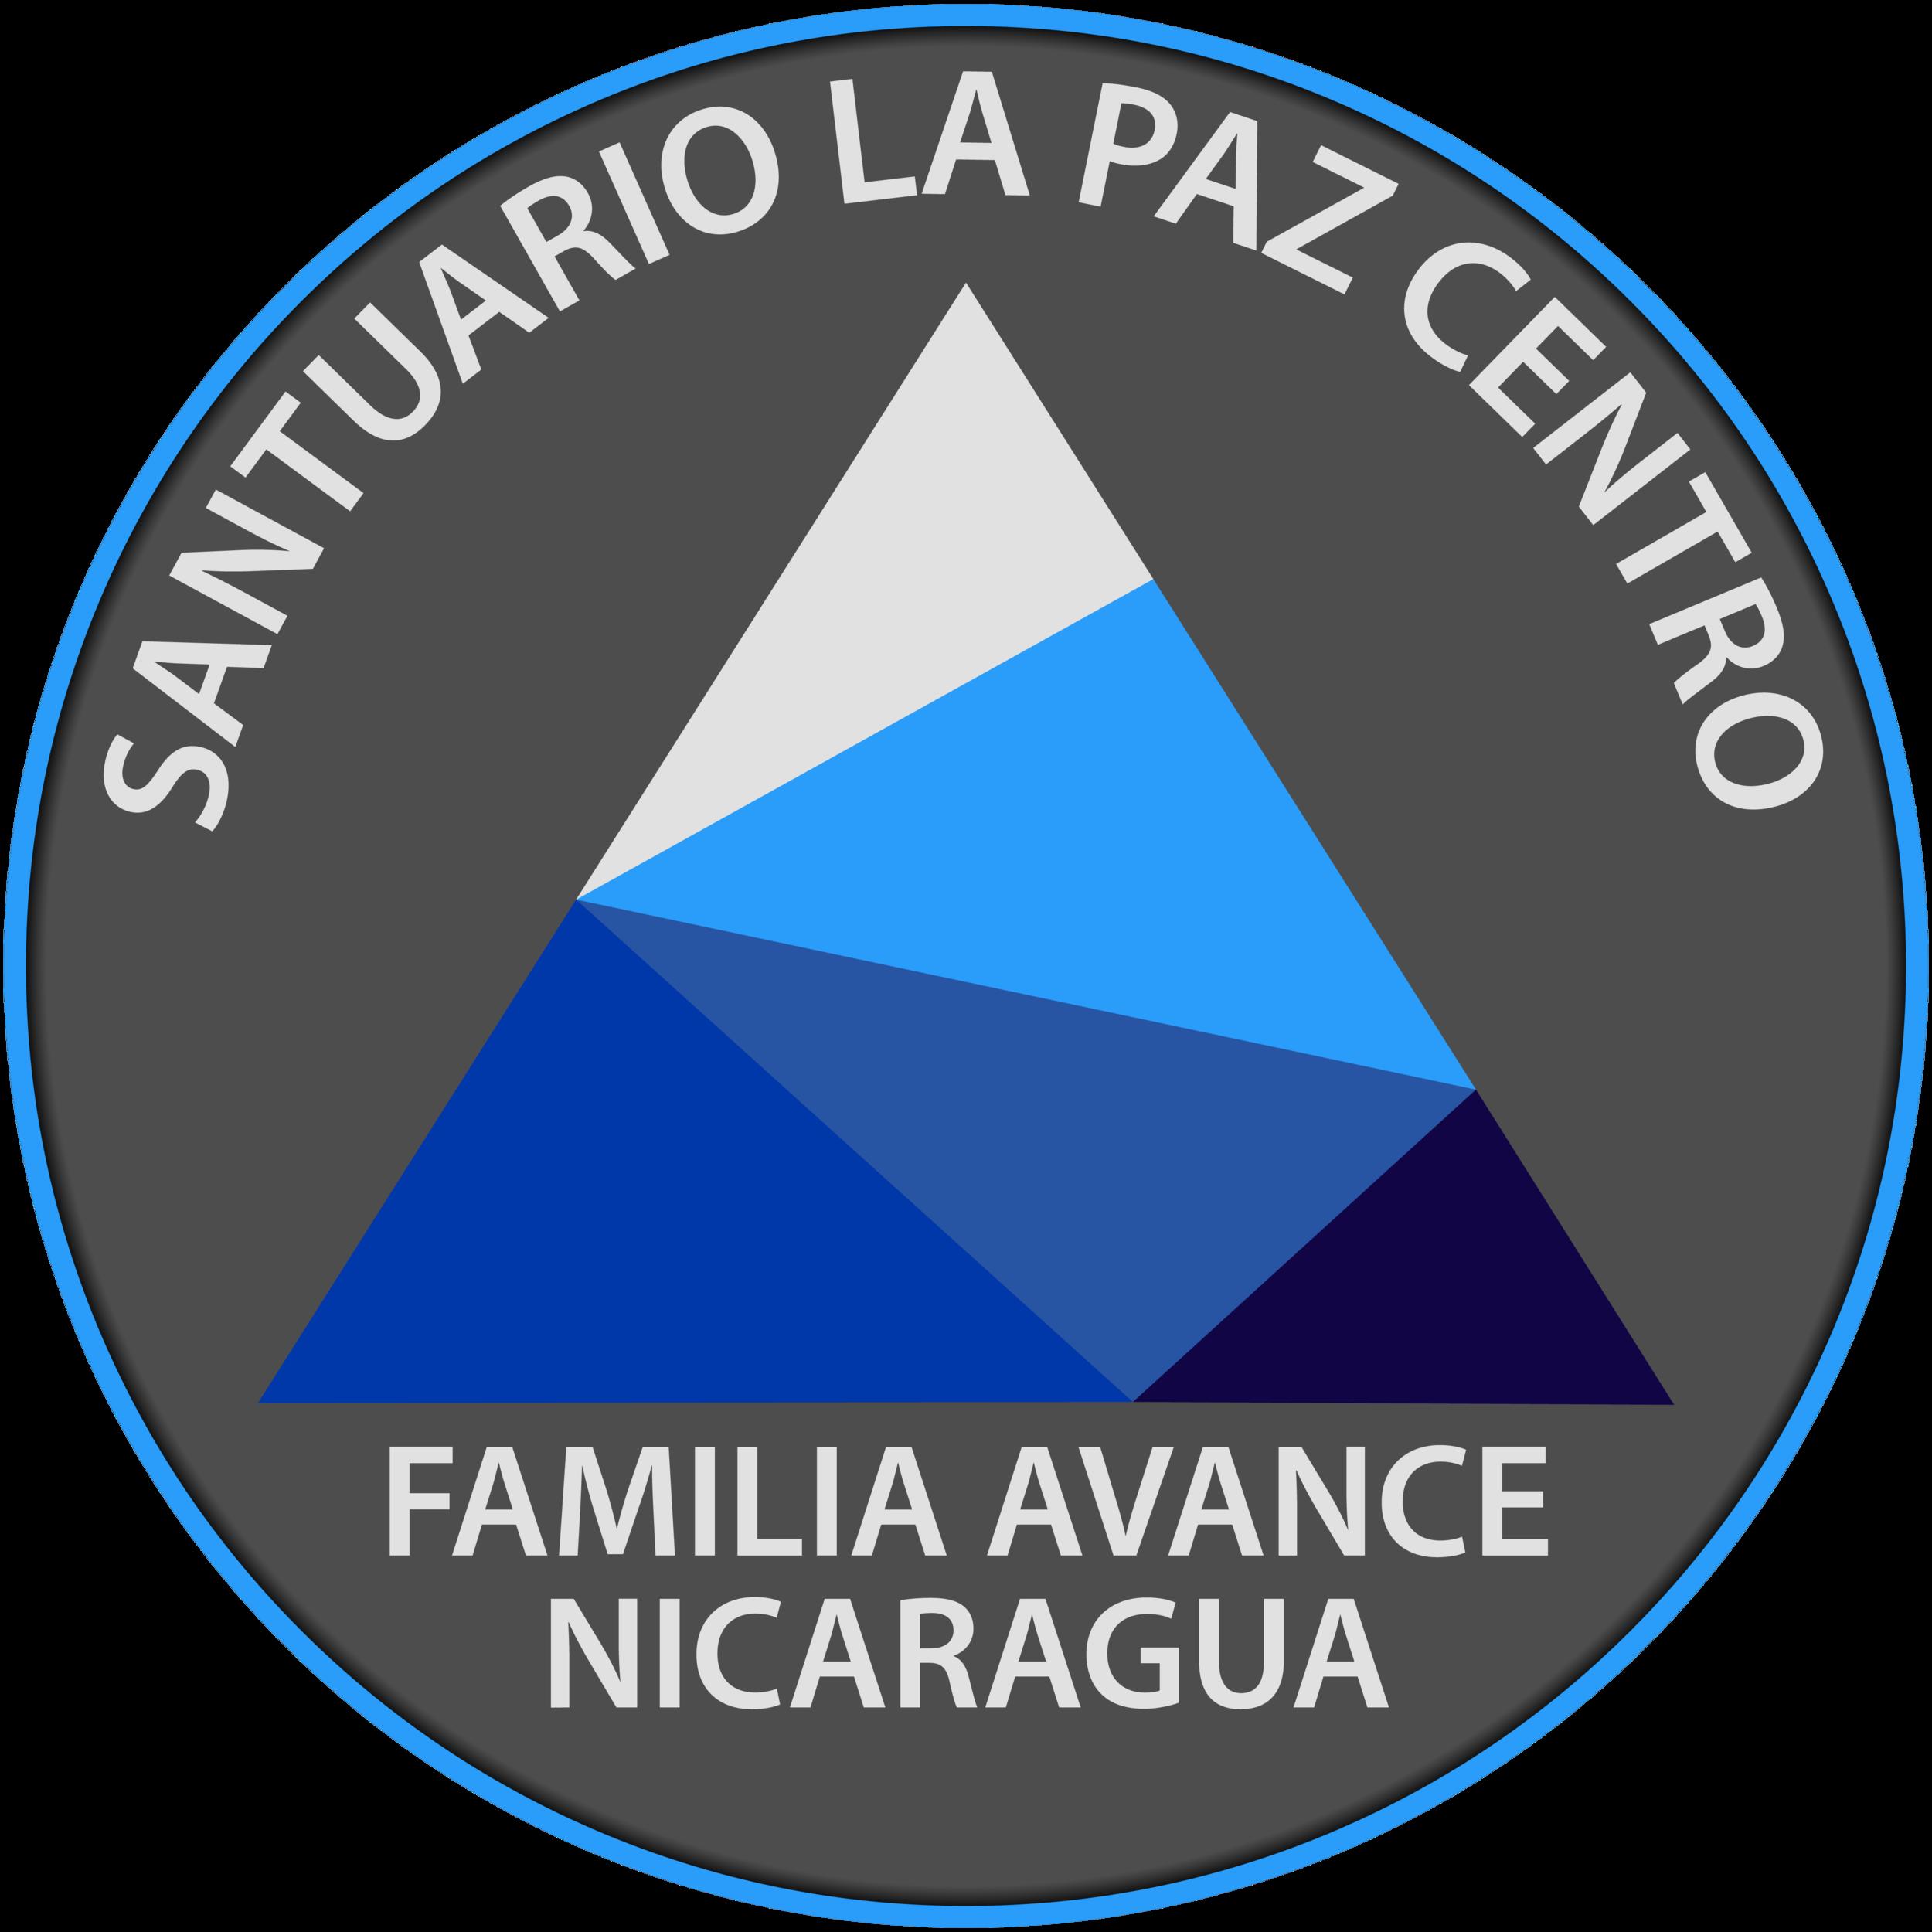 LaPazCentroLogo-01.png